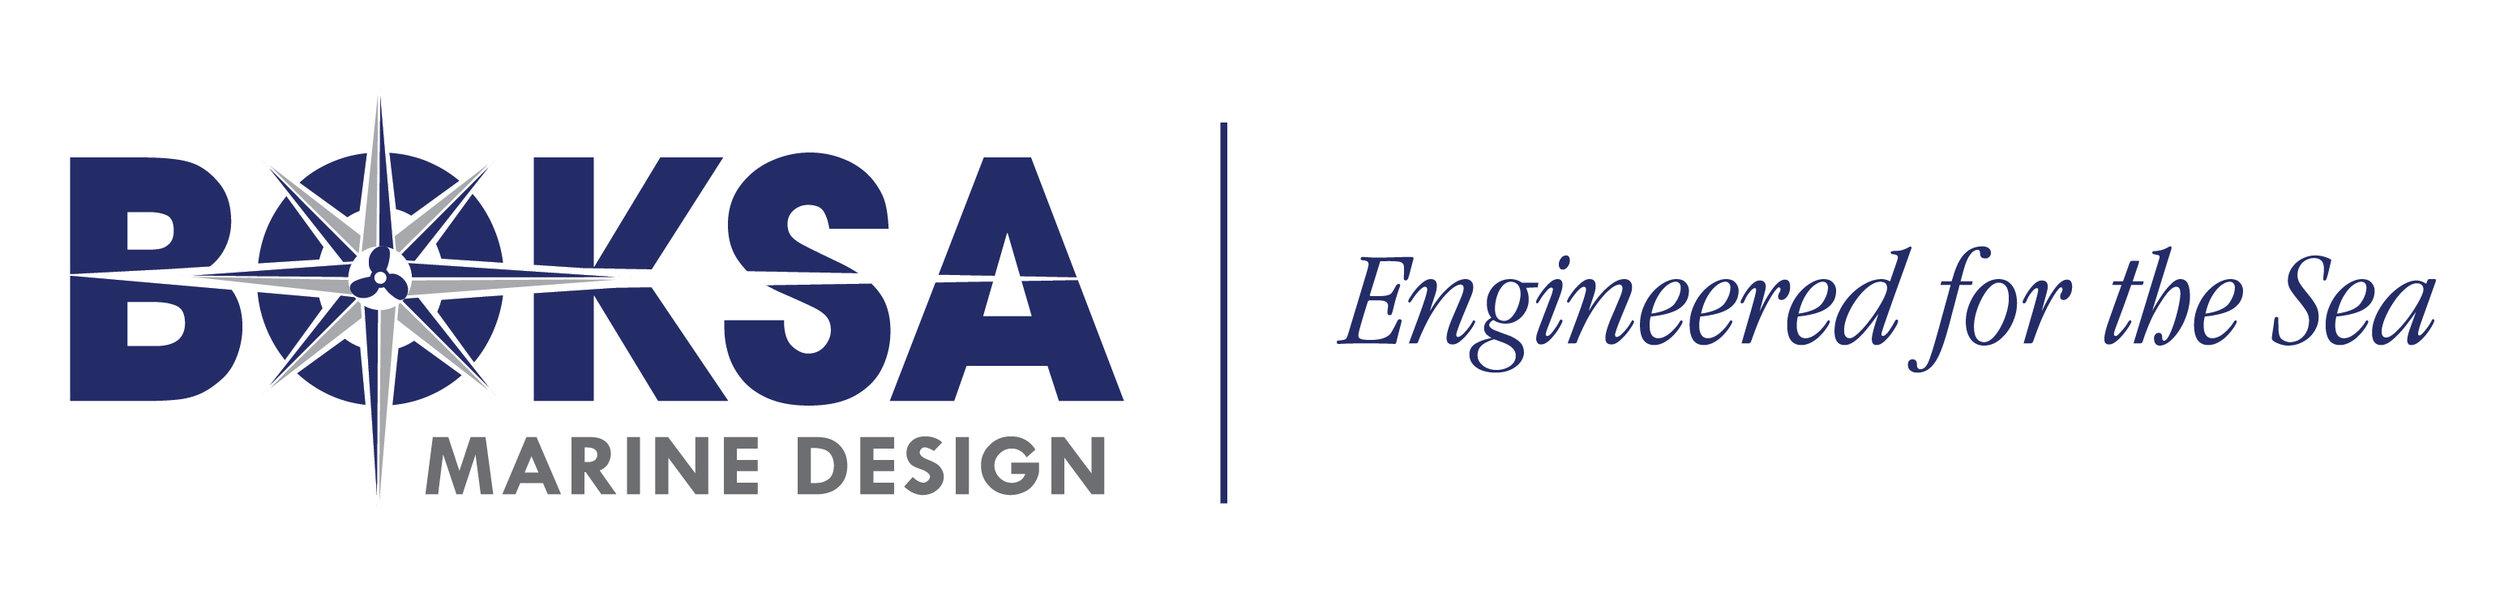 Boksa logo with tagline_RGB_HIGH.JPG